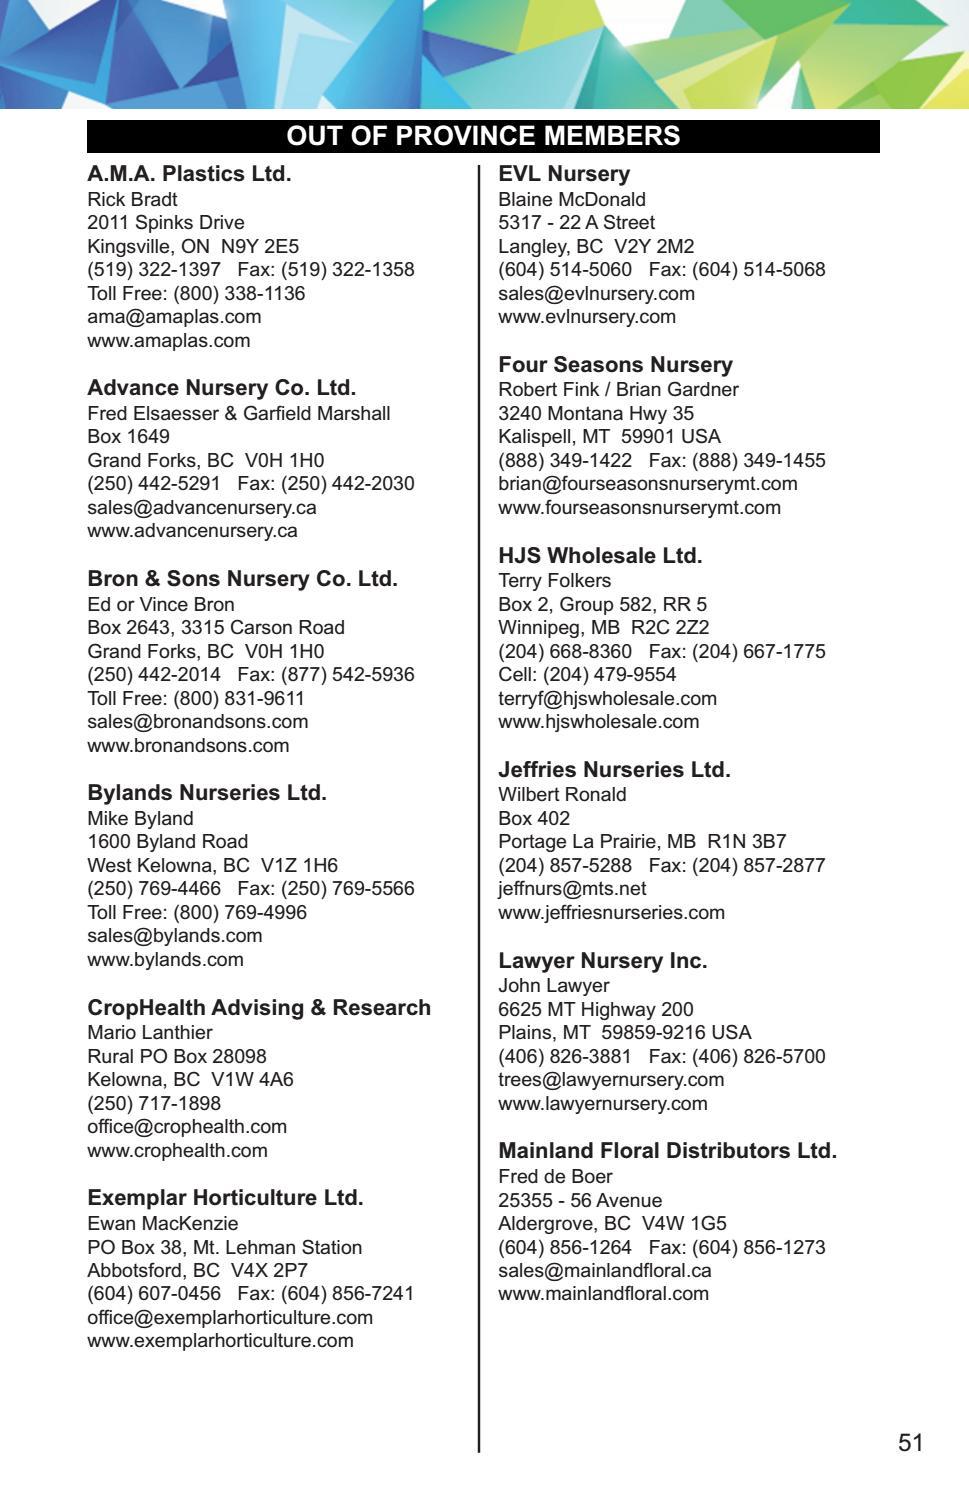 2017 Landscape Alberta Membership Directory